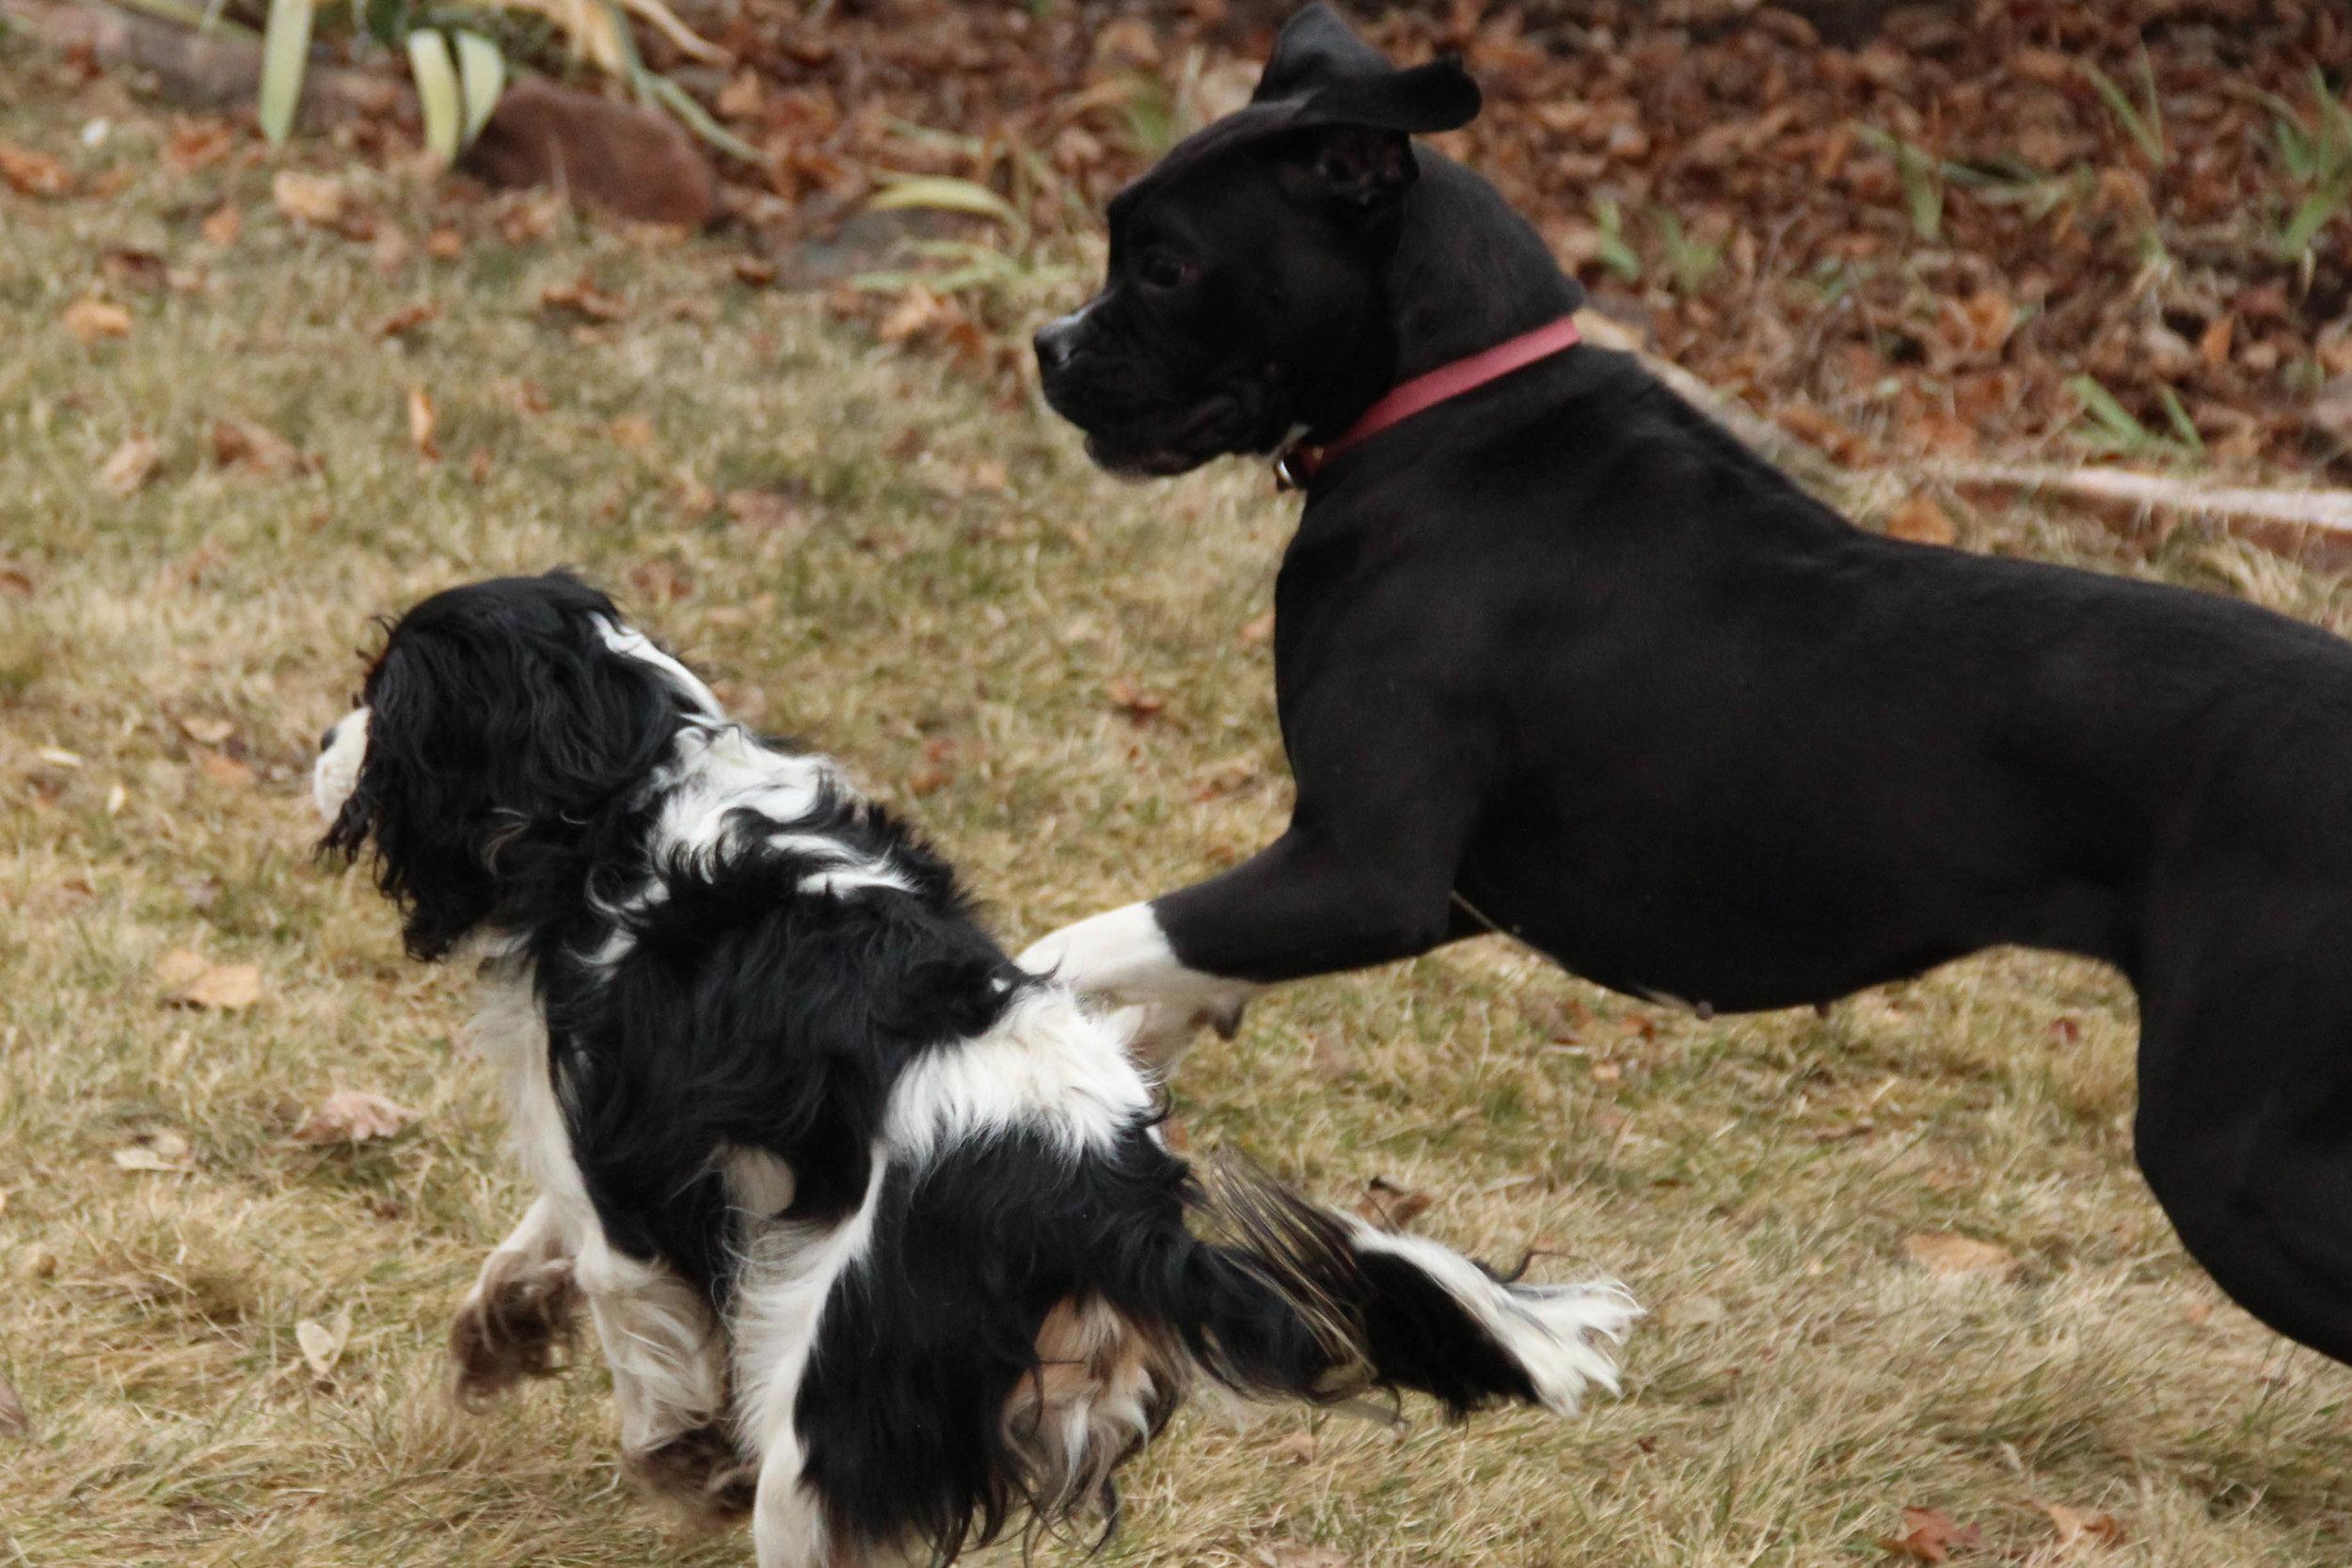 Reliable off leash dog training   Dog Ownership 101   Bakers Acres K9 Academy Blog